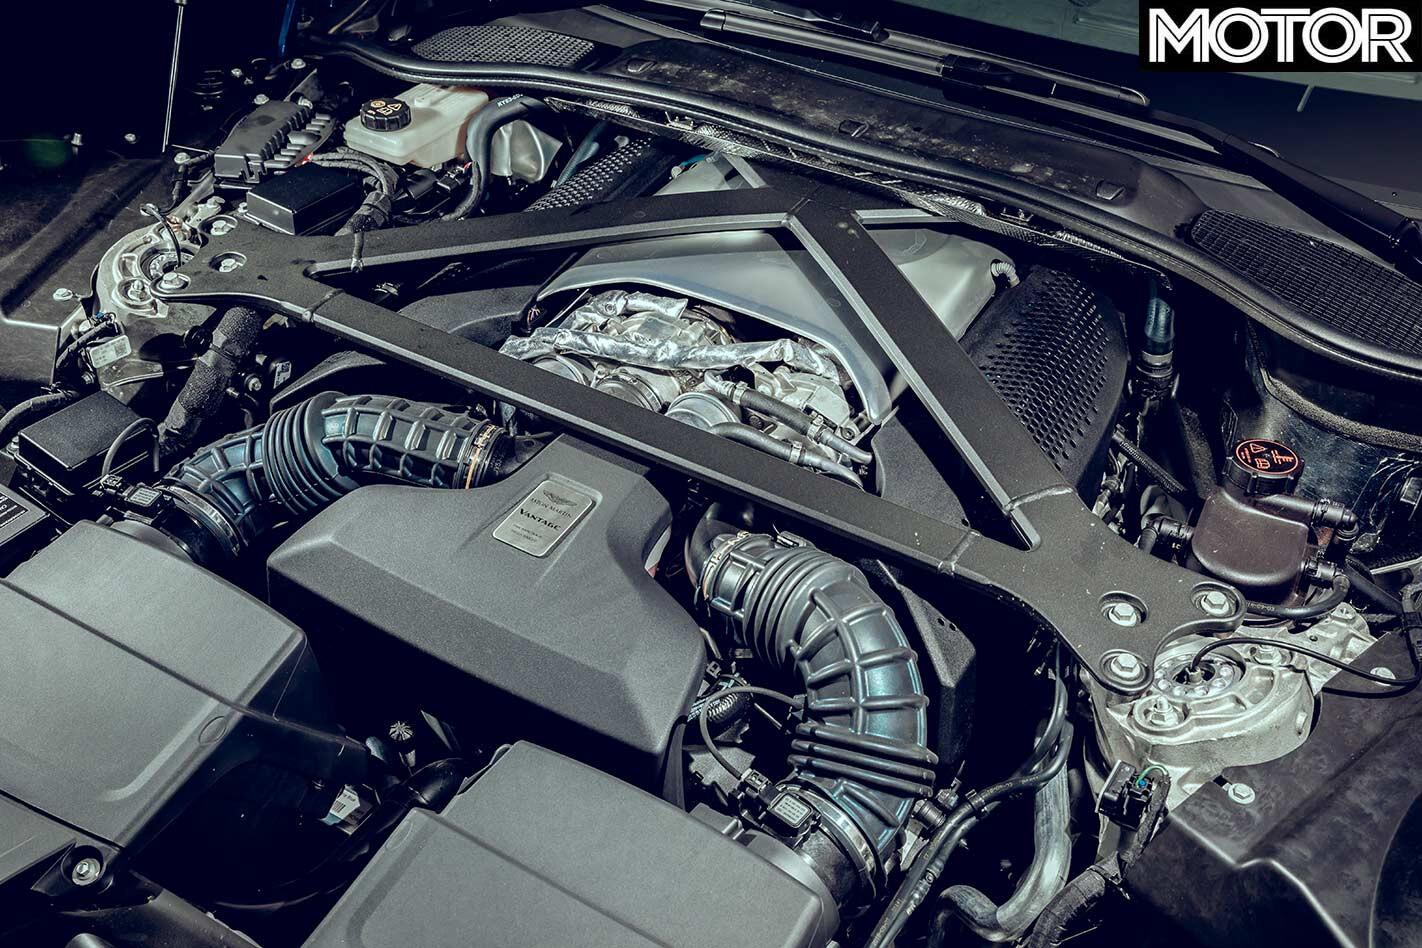 Aston Martin Vantage engine bay